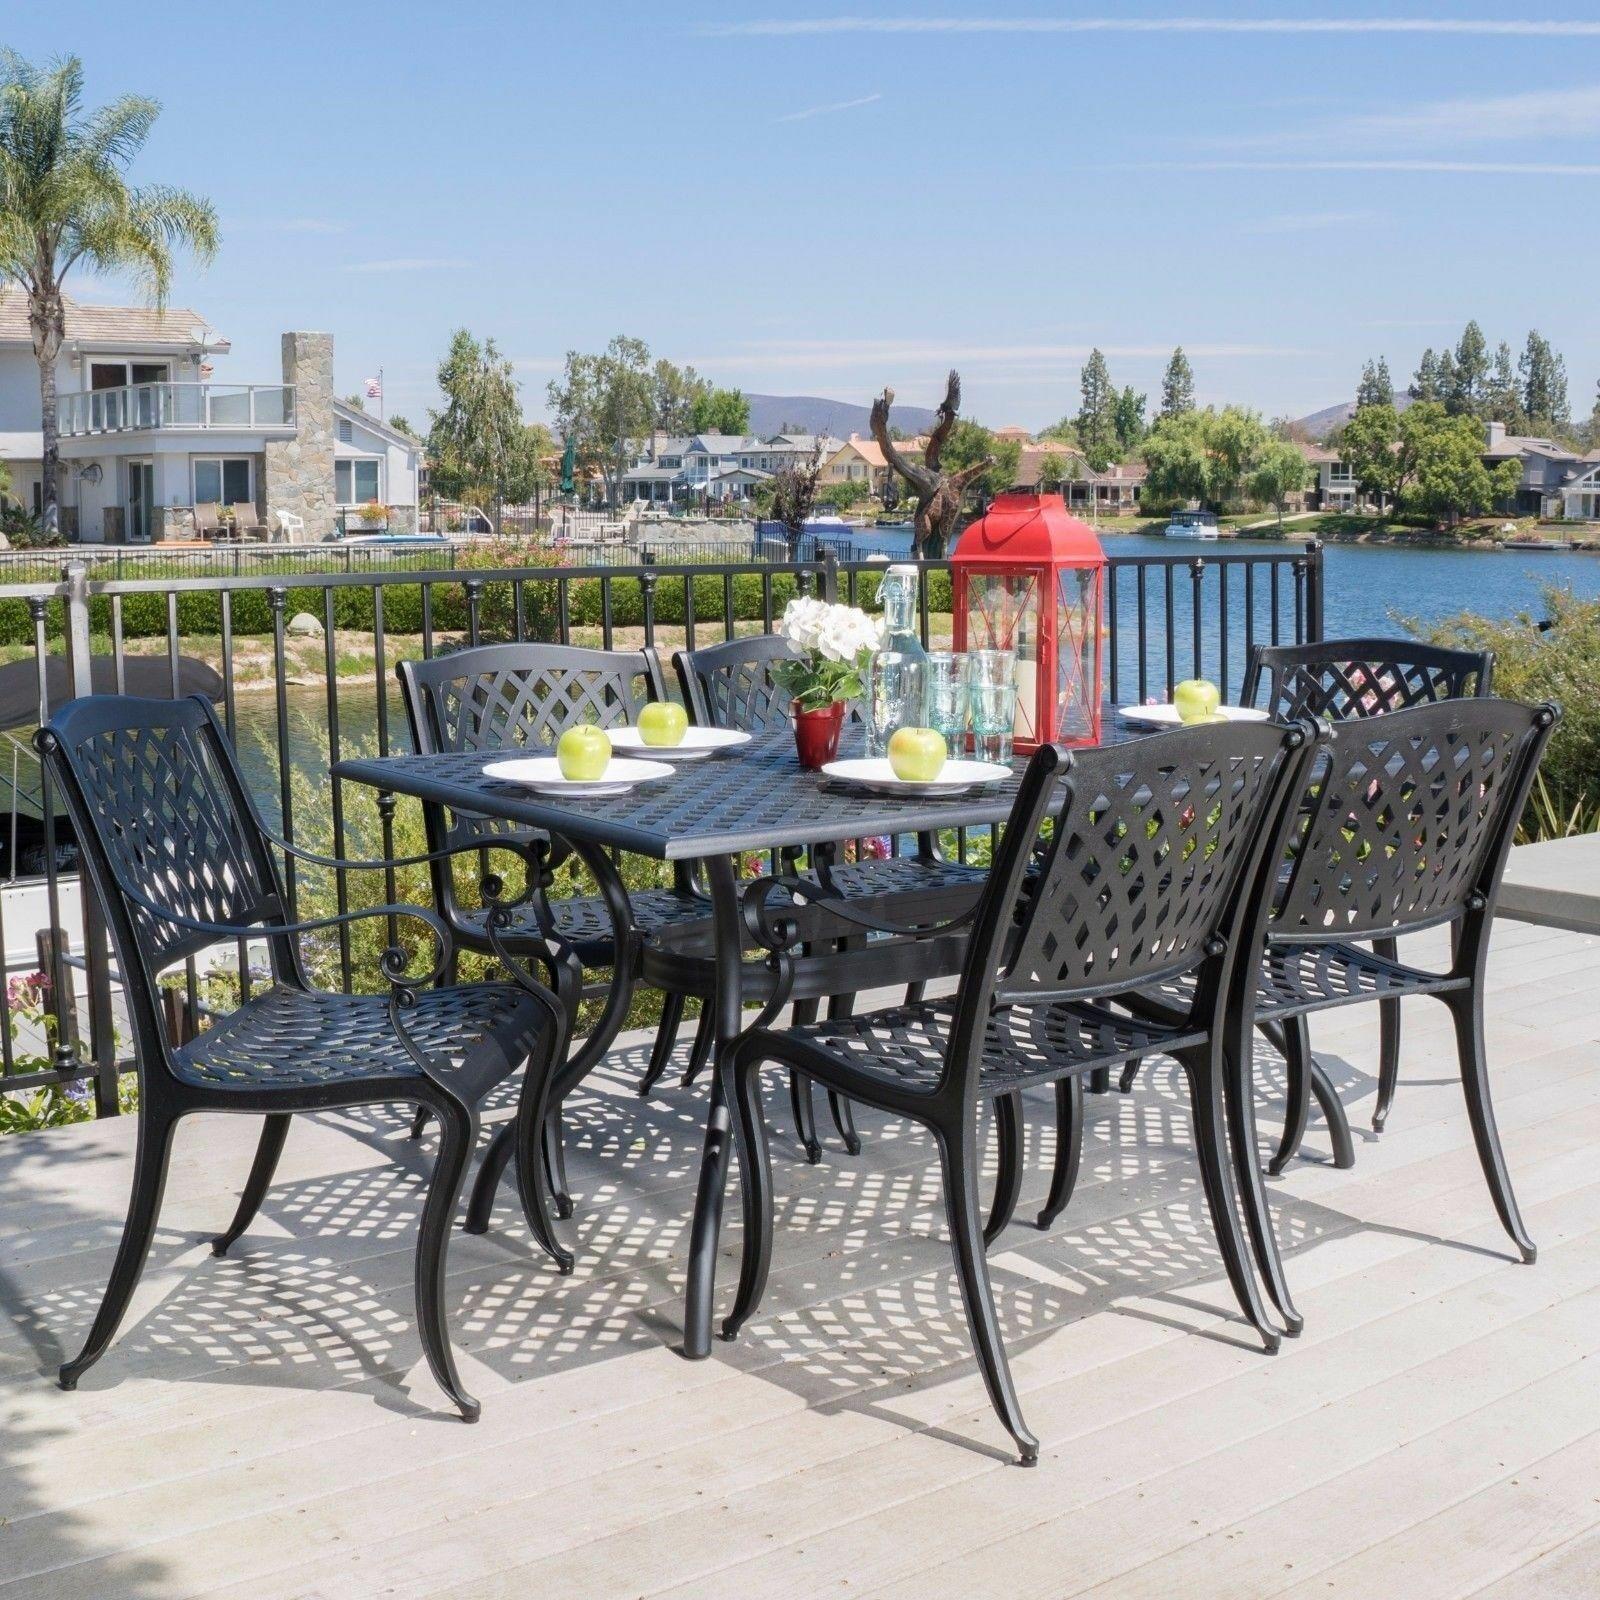 Marietta 10 piece Black Cast Aluminum Outdoor Dining Set